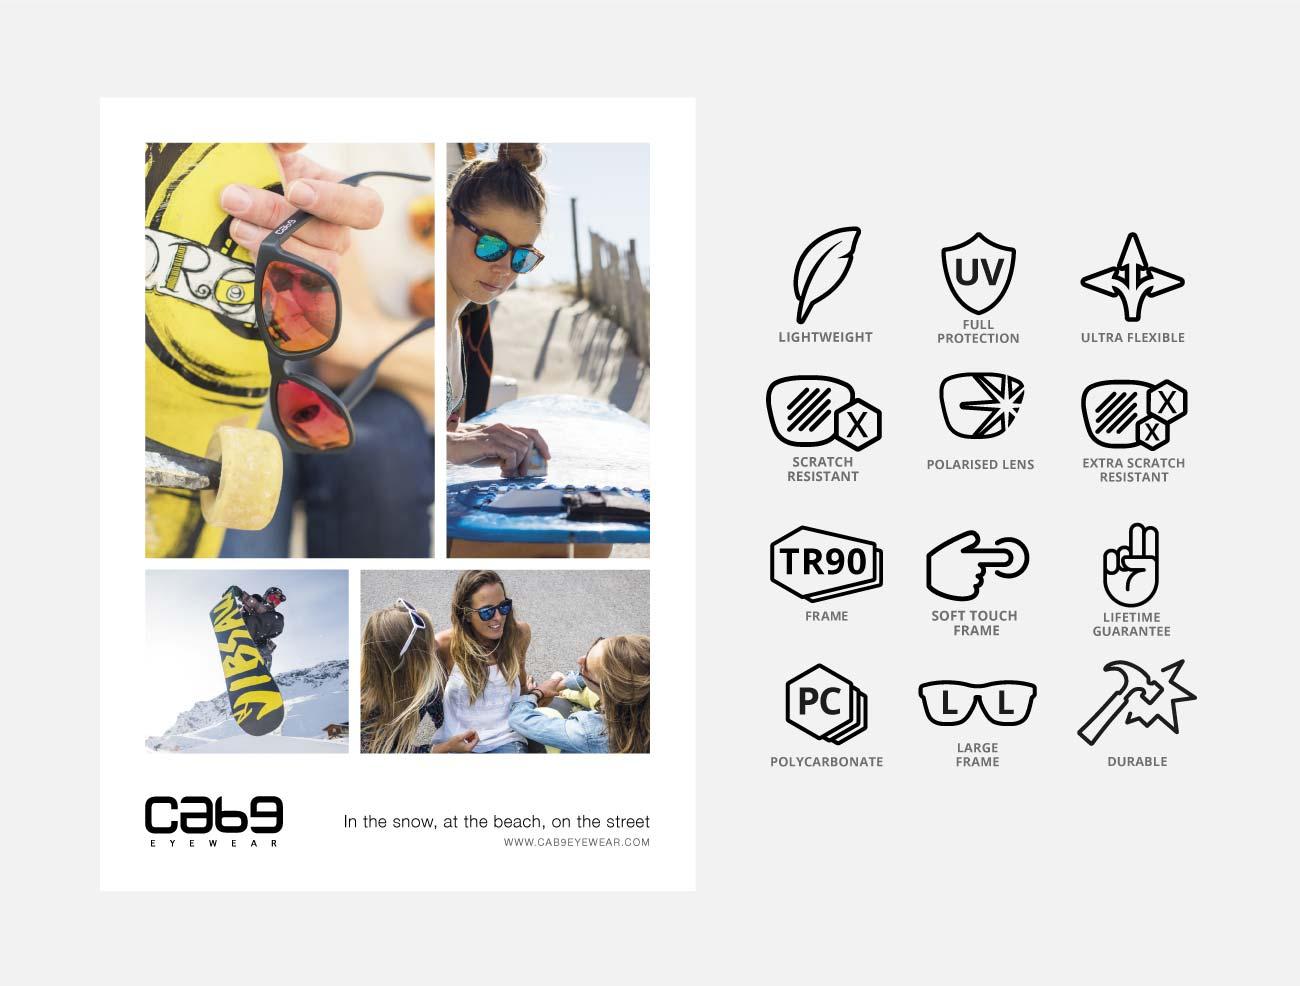 Icon Design, Advert Design, Cab9-Eyewear   John Shannon   Graphic Designer   Brighton